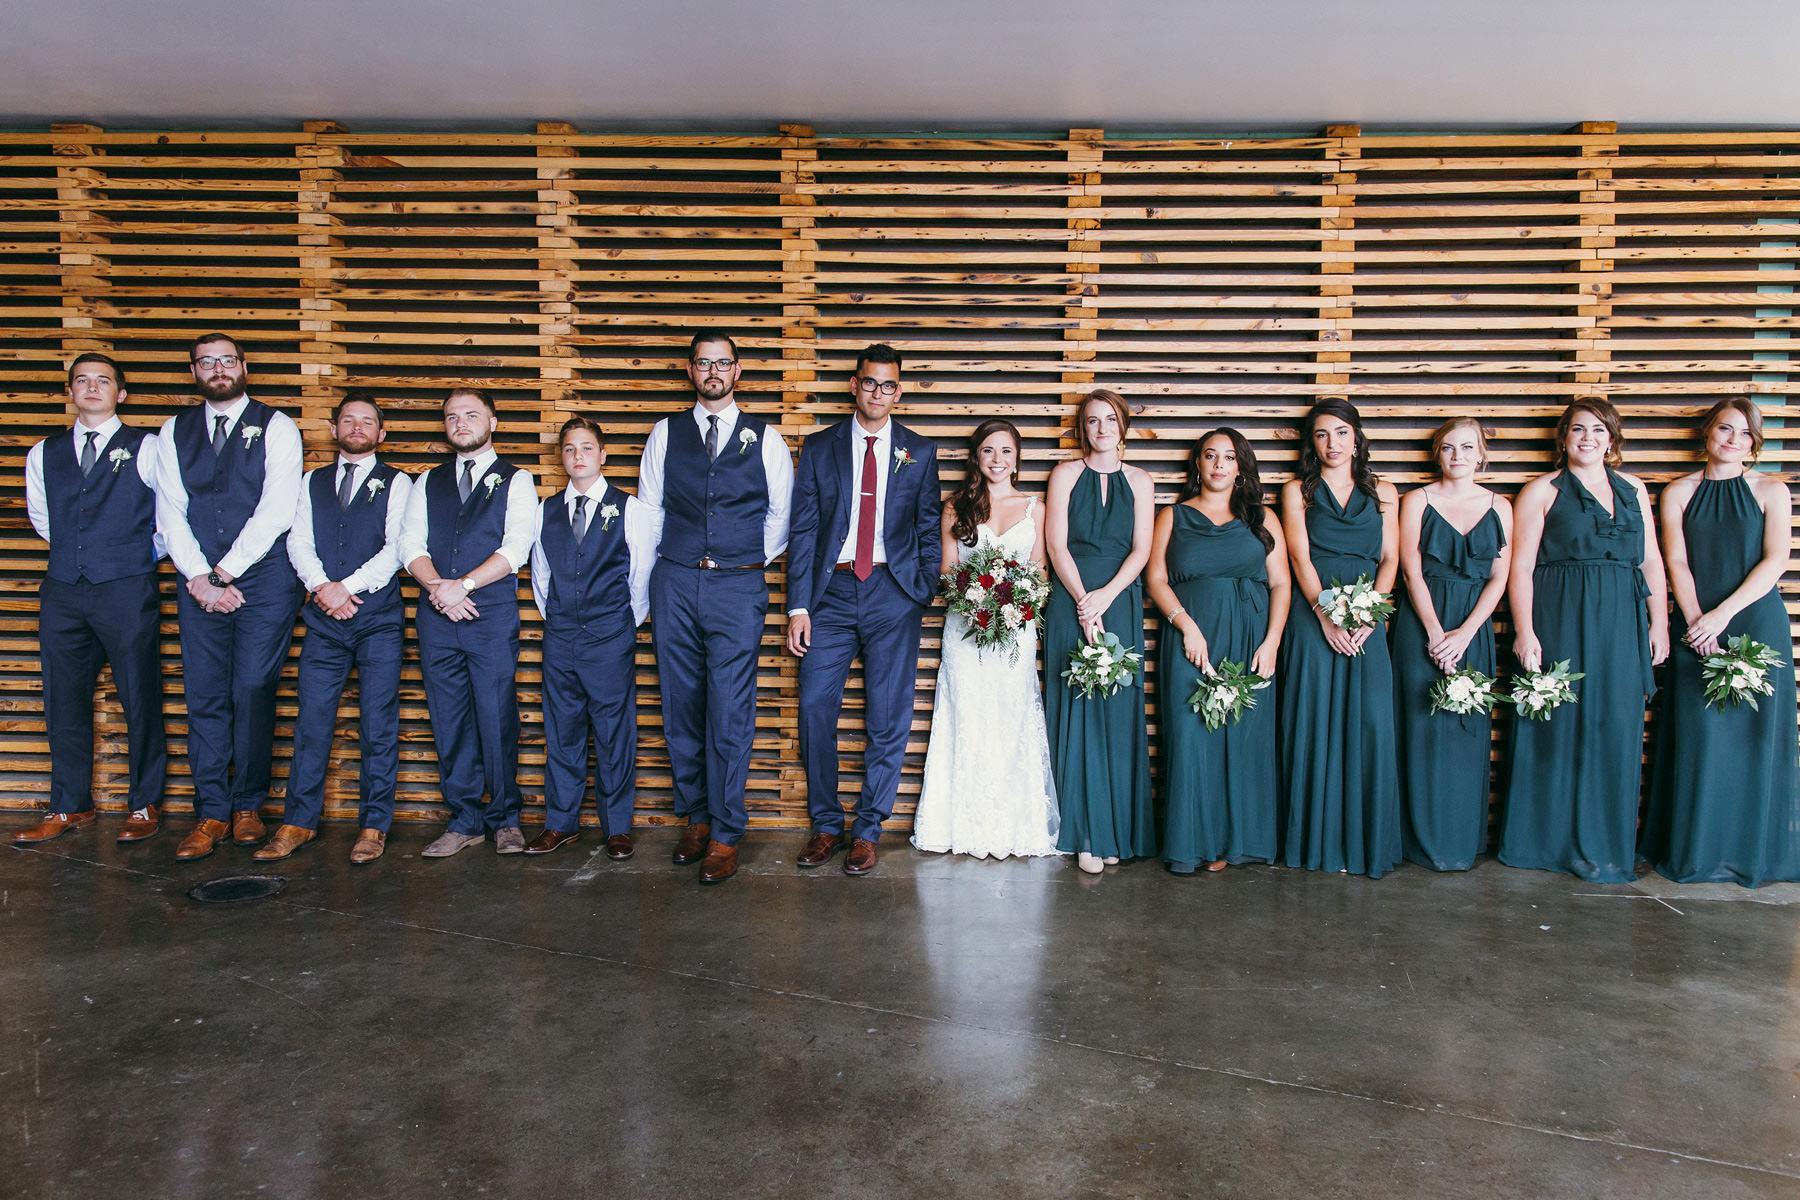 Kansas City Summer Wedding at the Guild_Kindling Wedding Photography Blog35.JPG